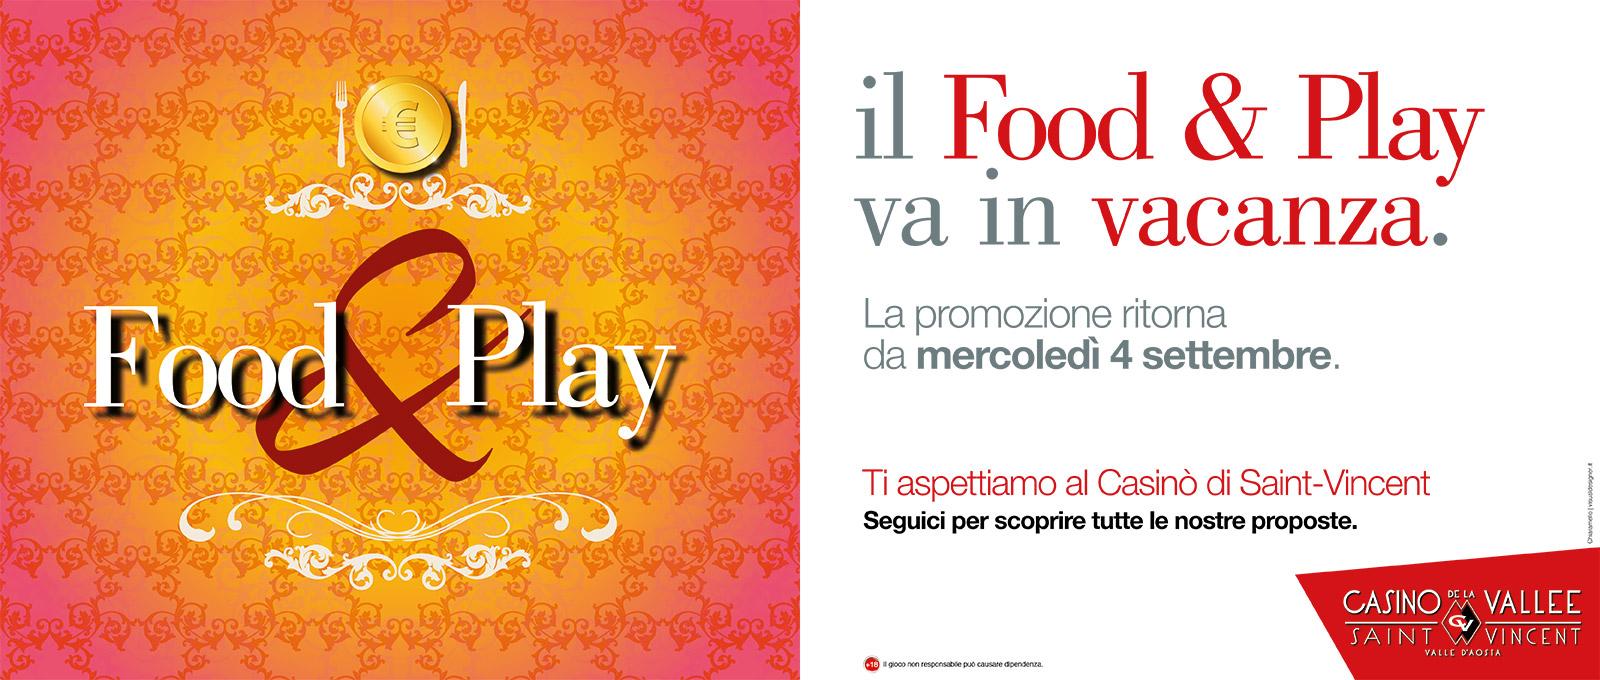 Il Food & Play va in vacanza